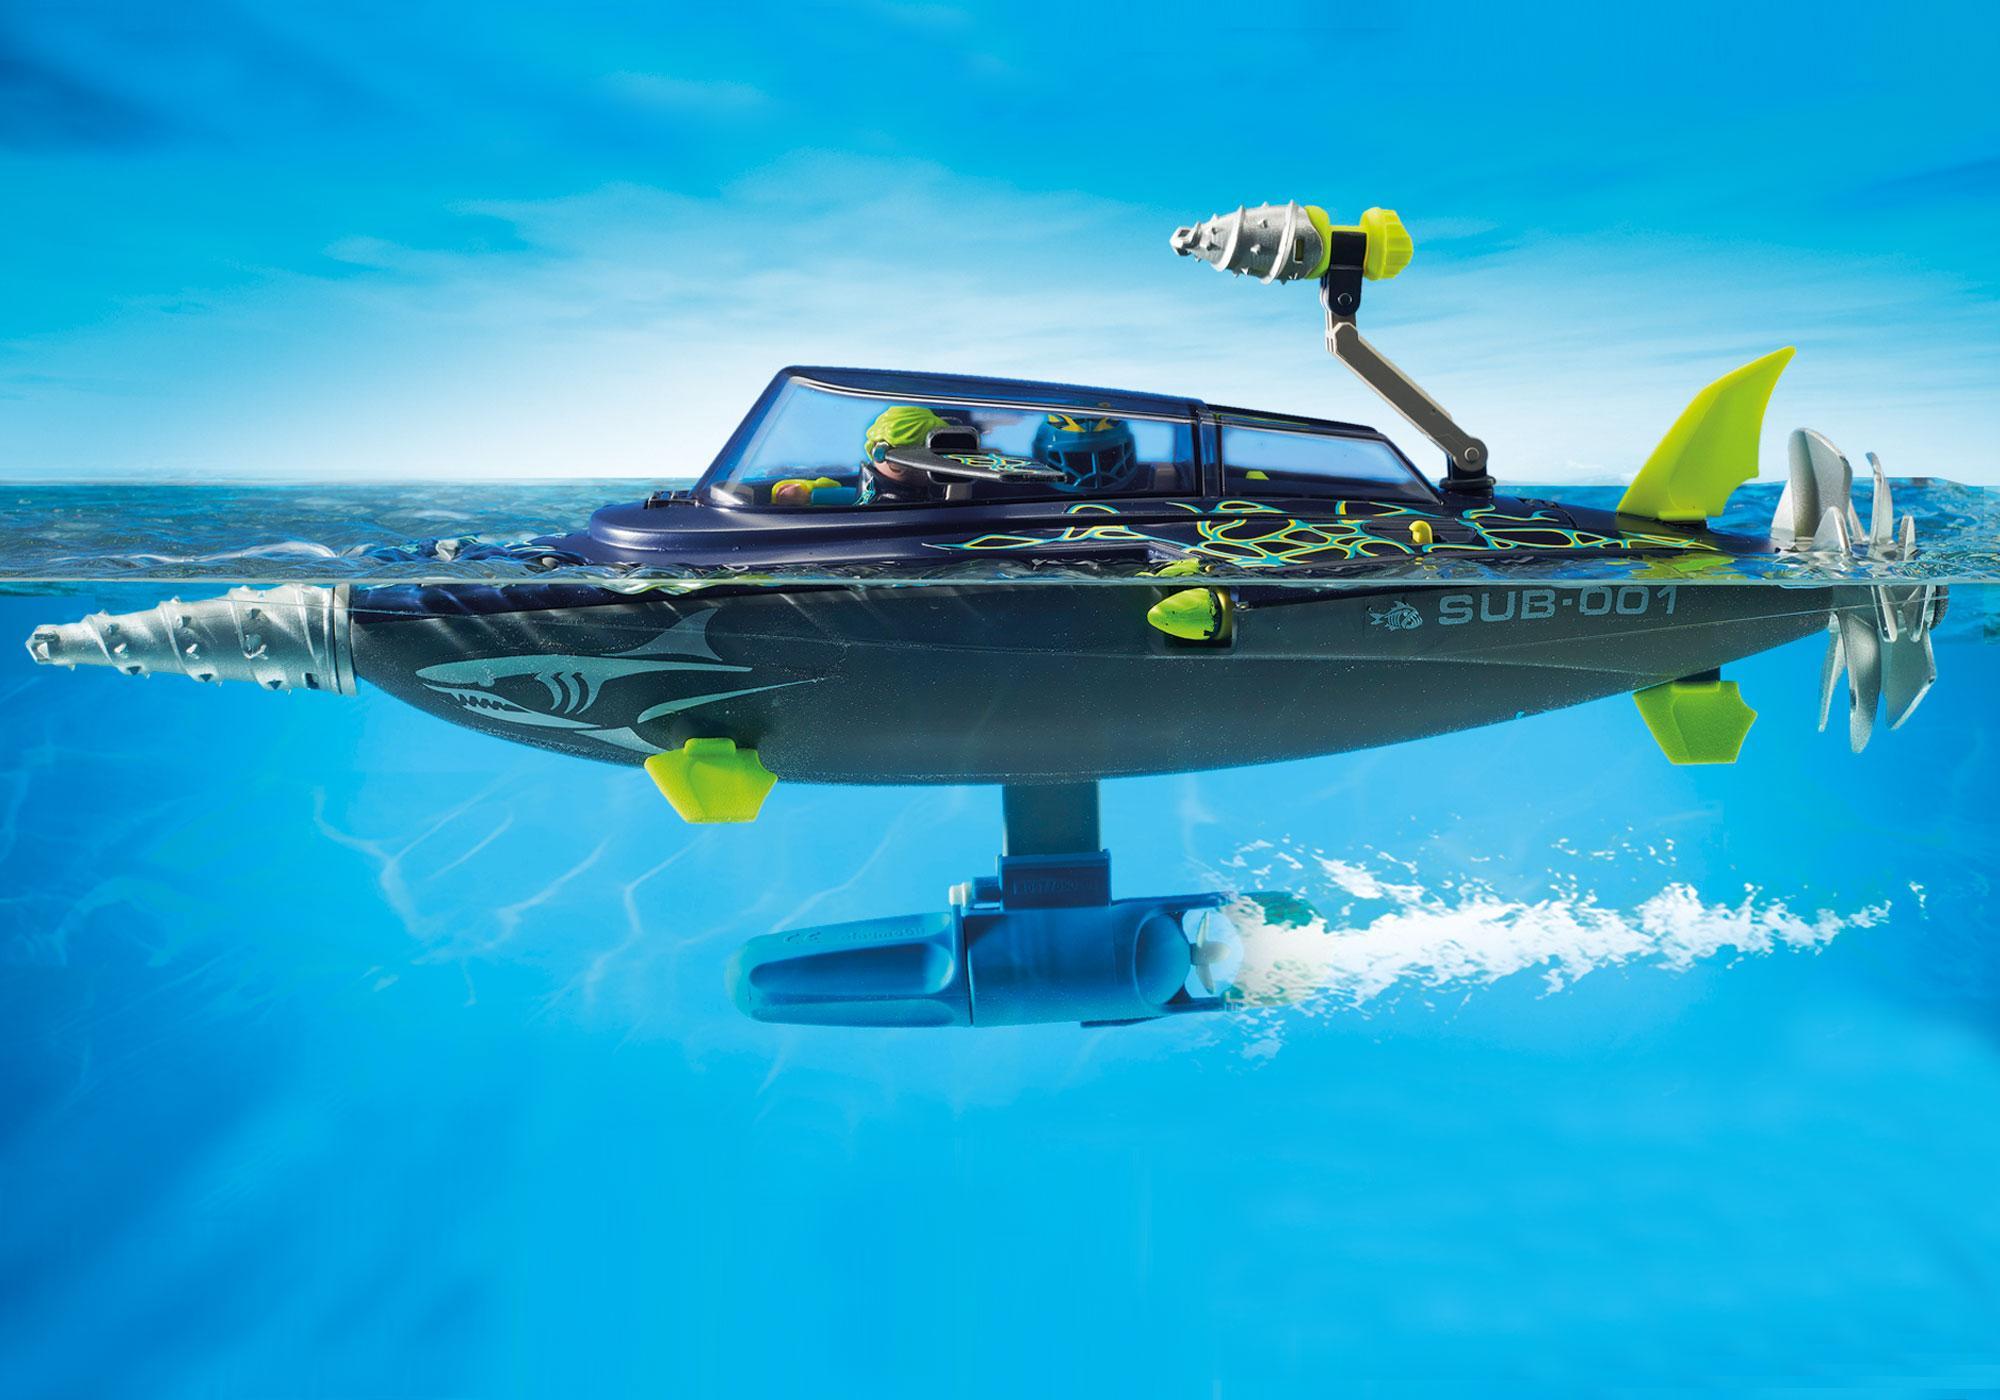 http://media.playmobil.com/i/playmobil/70005_product_extra2/TEAM S.H.A.R.K. Drill Destroyer